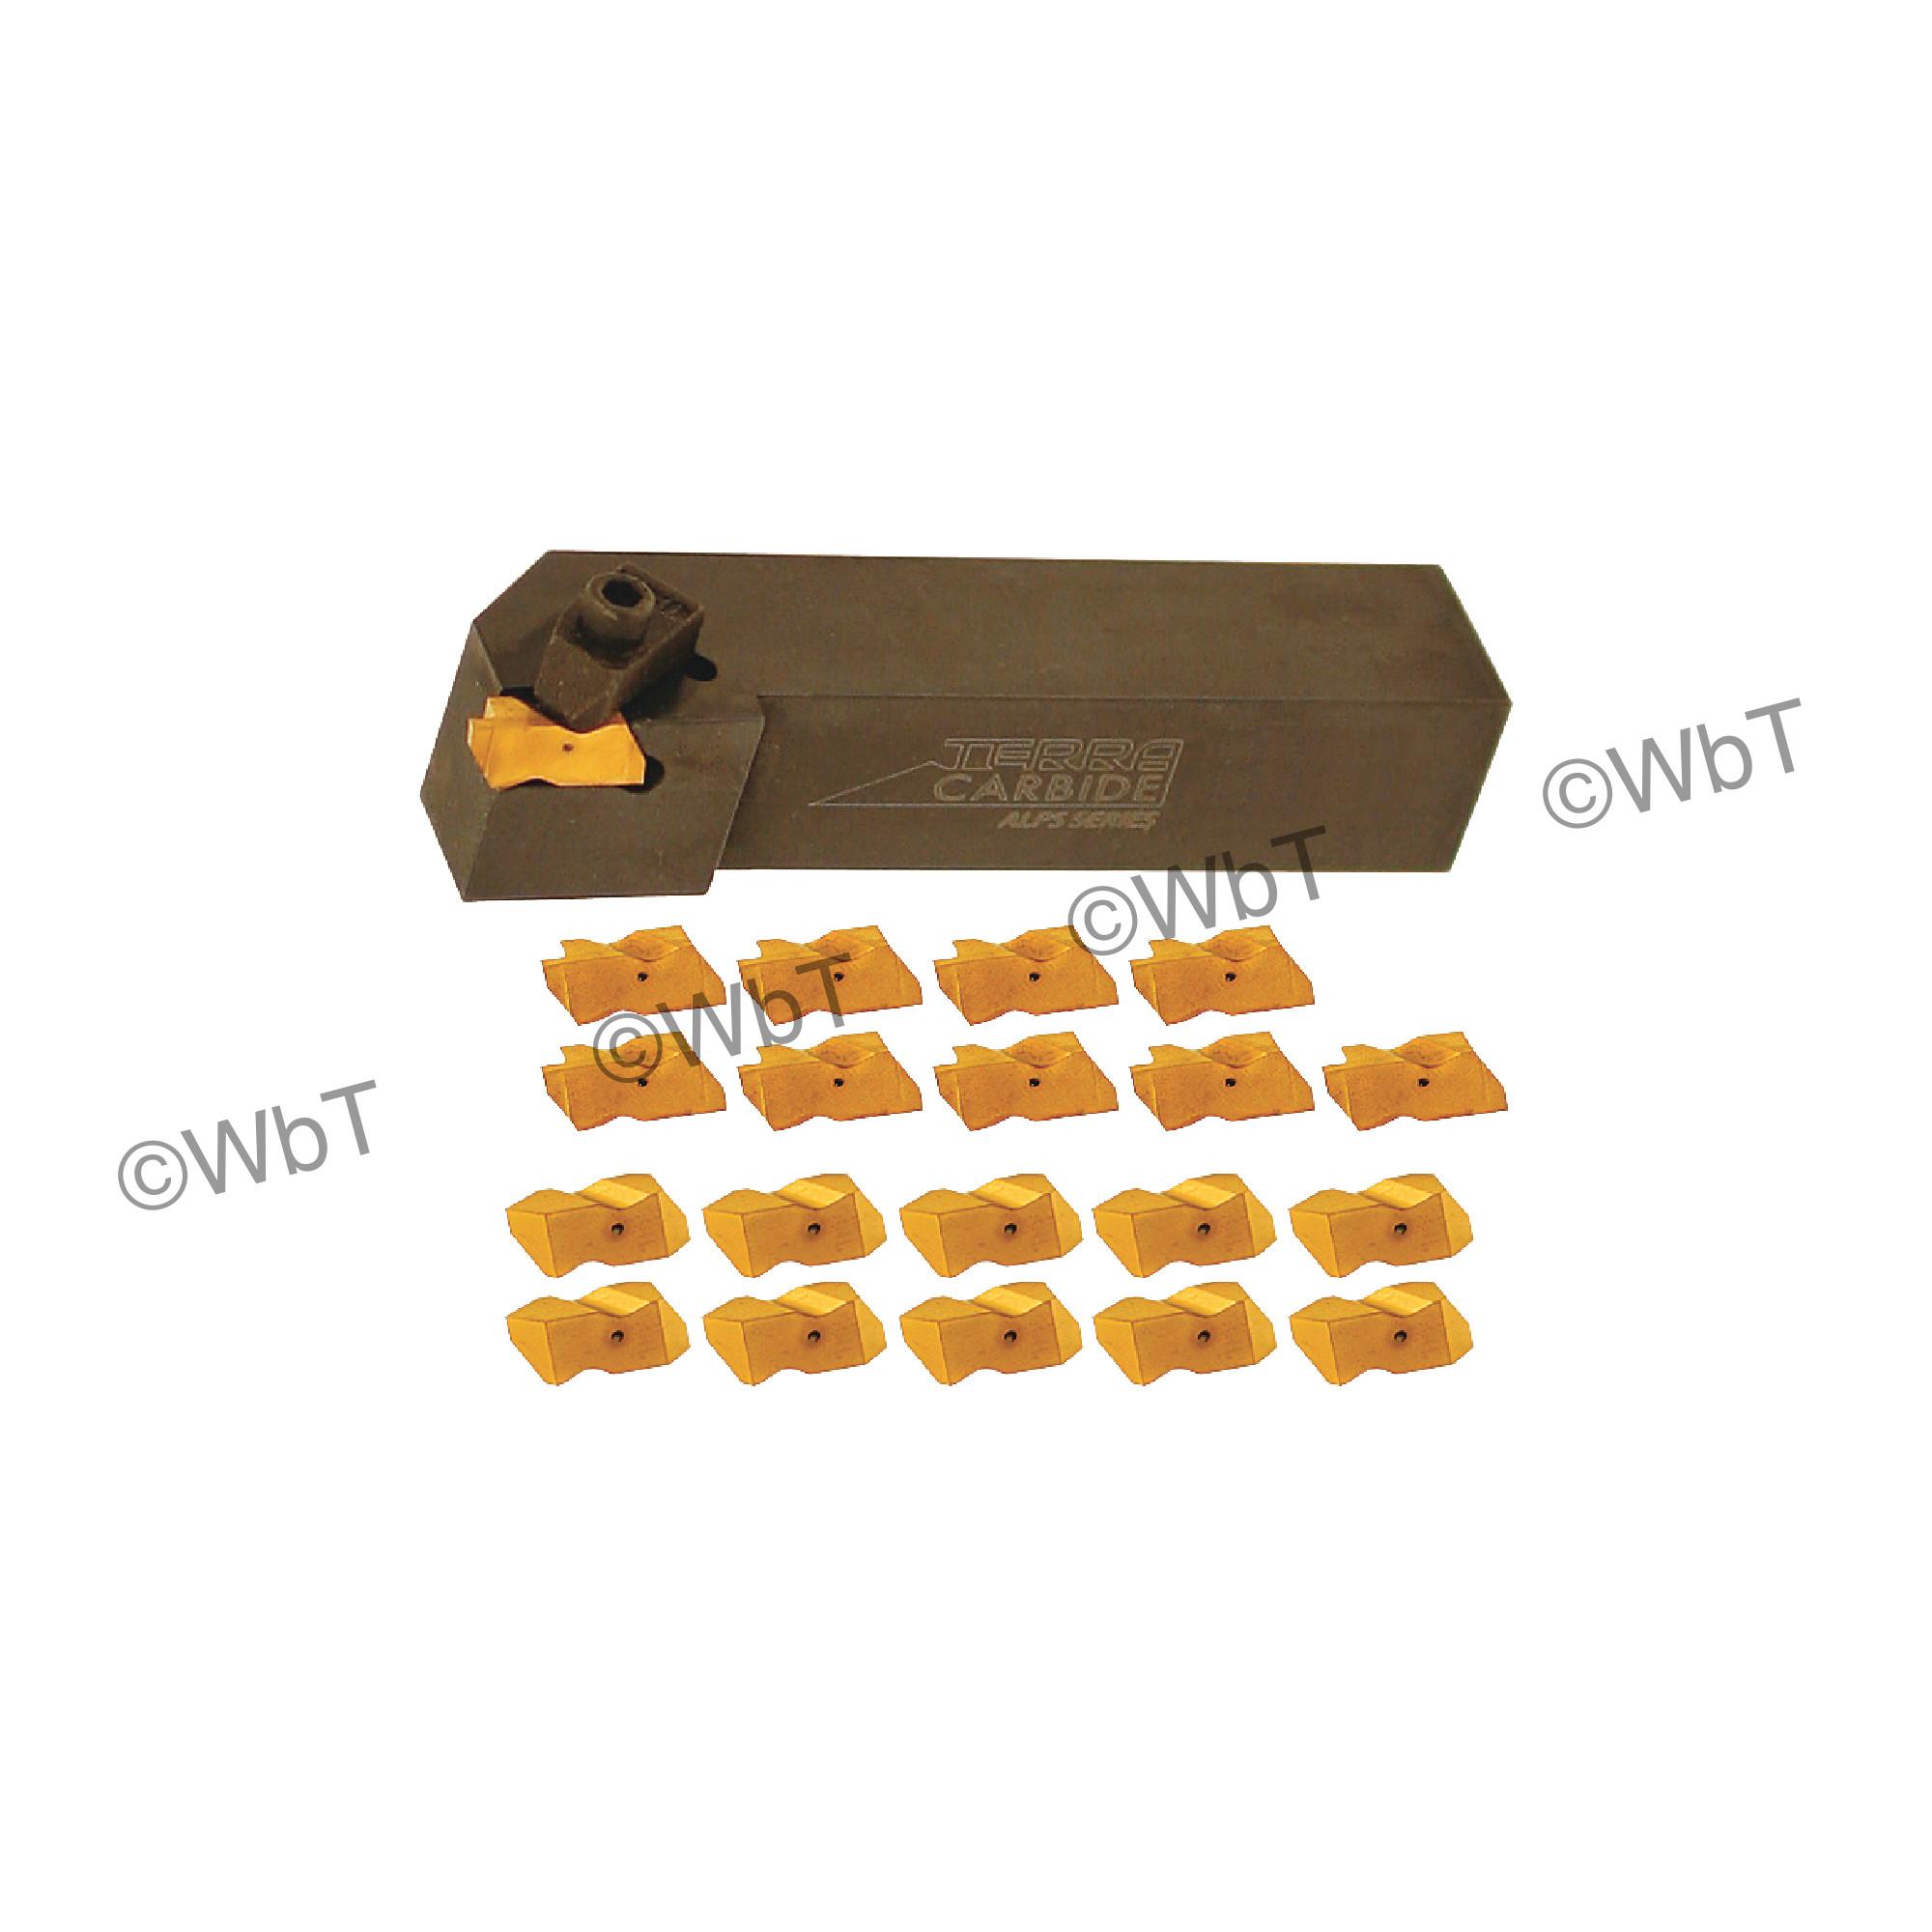 "TERRA CARBIDE - TNSR12-3B / 0.750"" Shank External Holder Sets with (10) TNG 3062R APC5T Inserts & (10) TNT3R APC5T Inser"